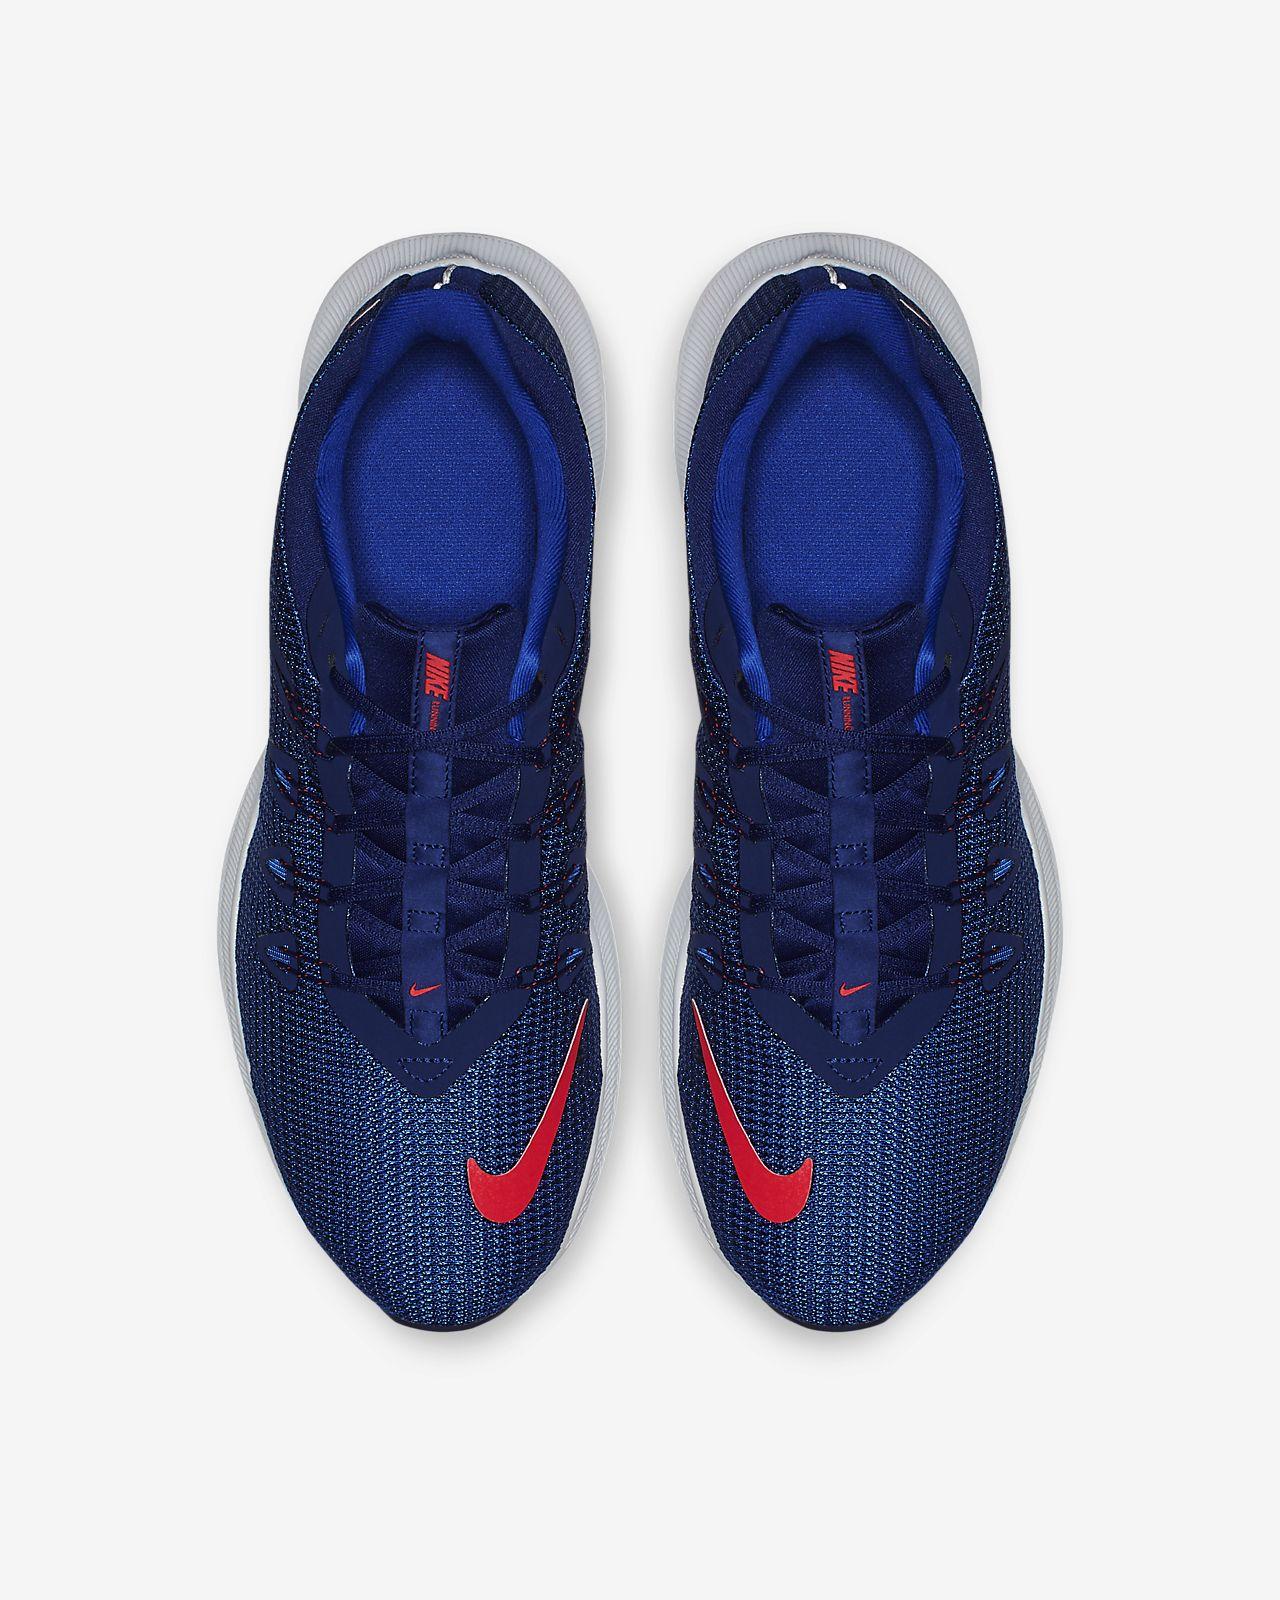 Pour Running Chaussure De Nike Quest Homme kuTPXwlOZi